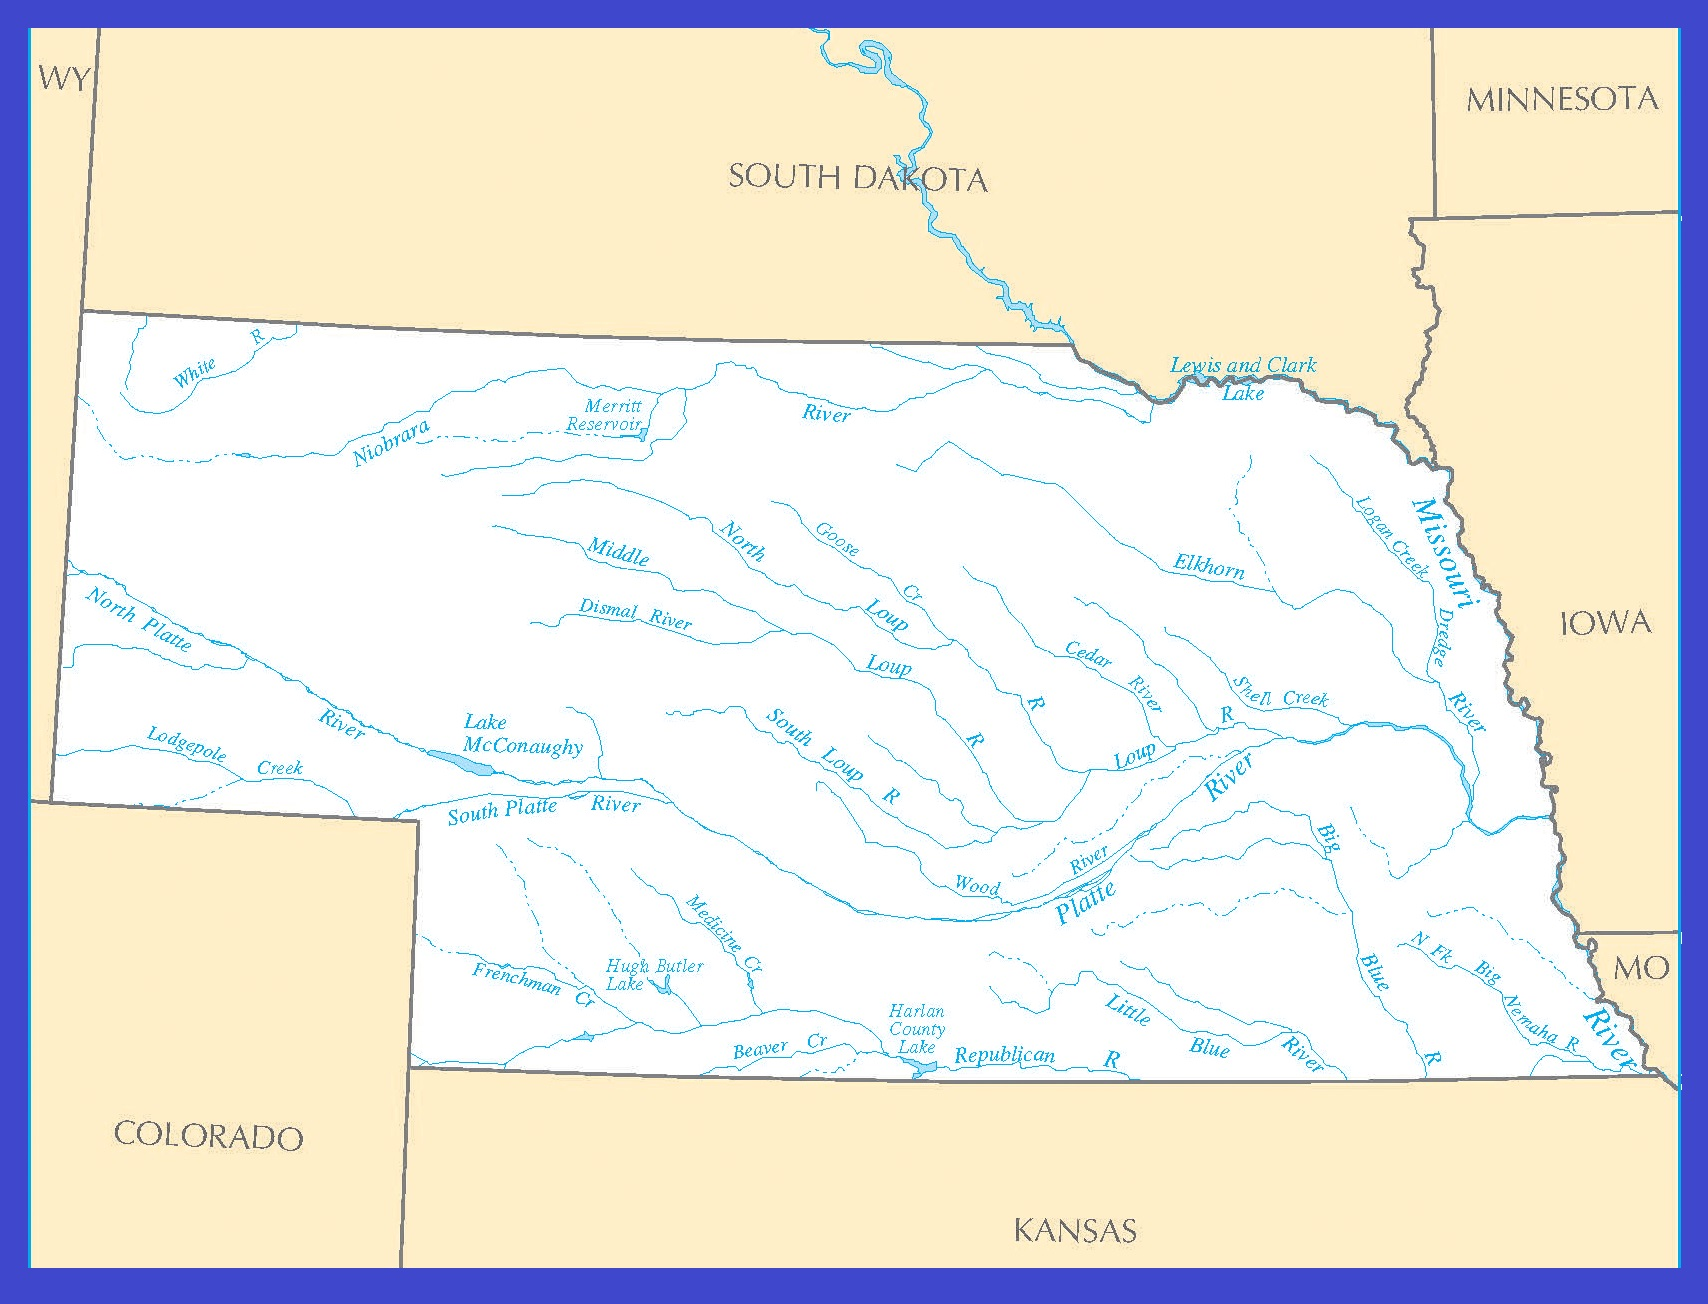 Nebraska Rivers Map | Large Printable High Resolution and Standard Map